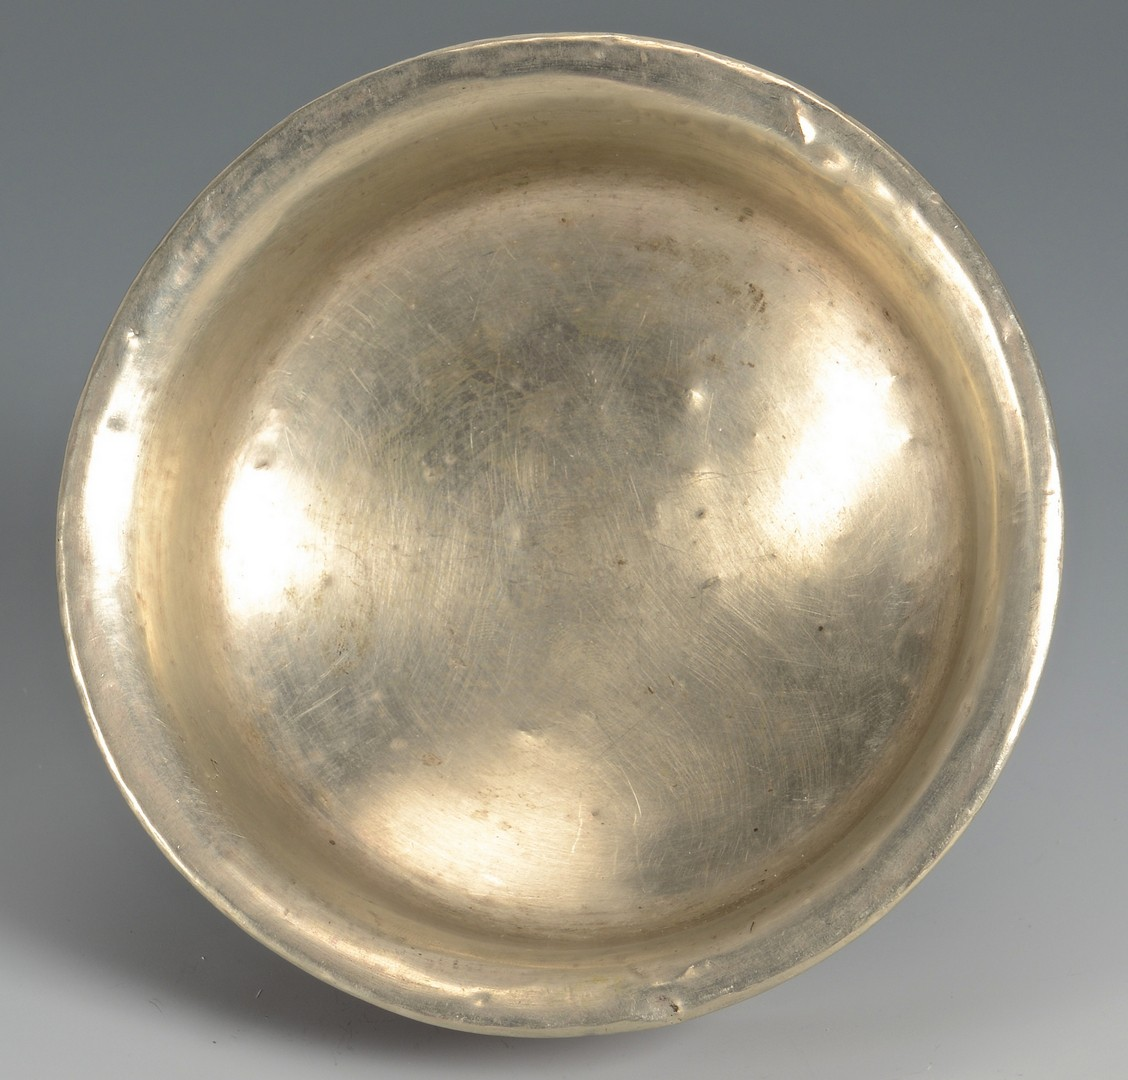 Lot 376: Tibetan Burl Wood & Silver Tea Bowl